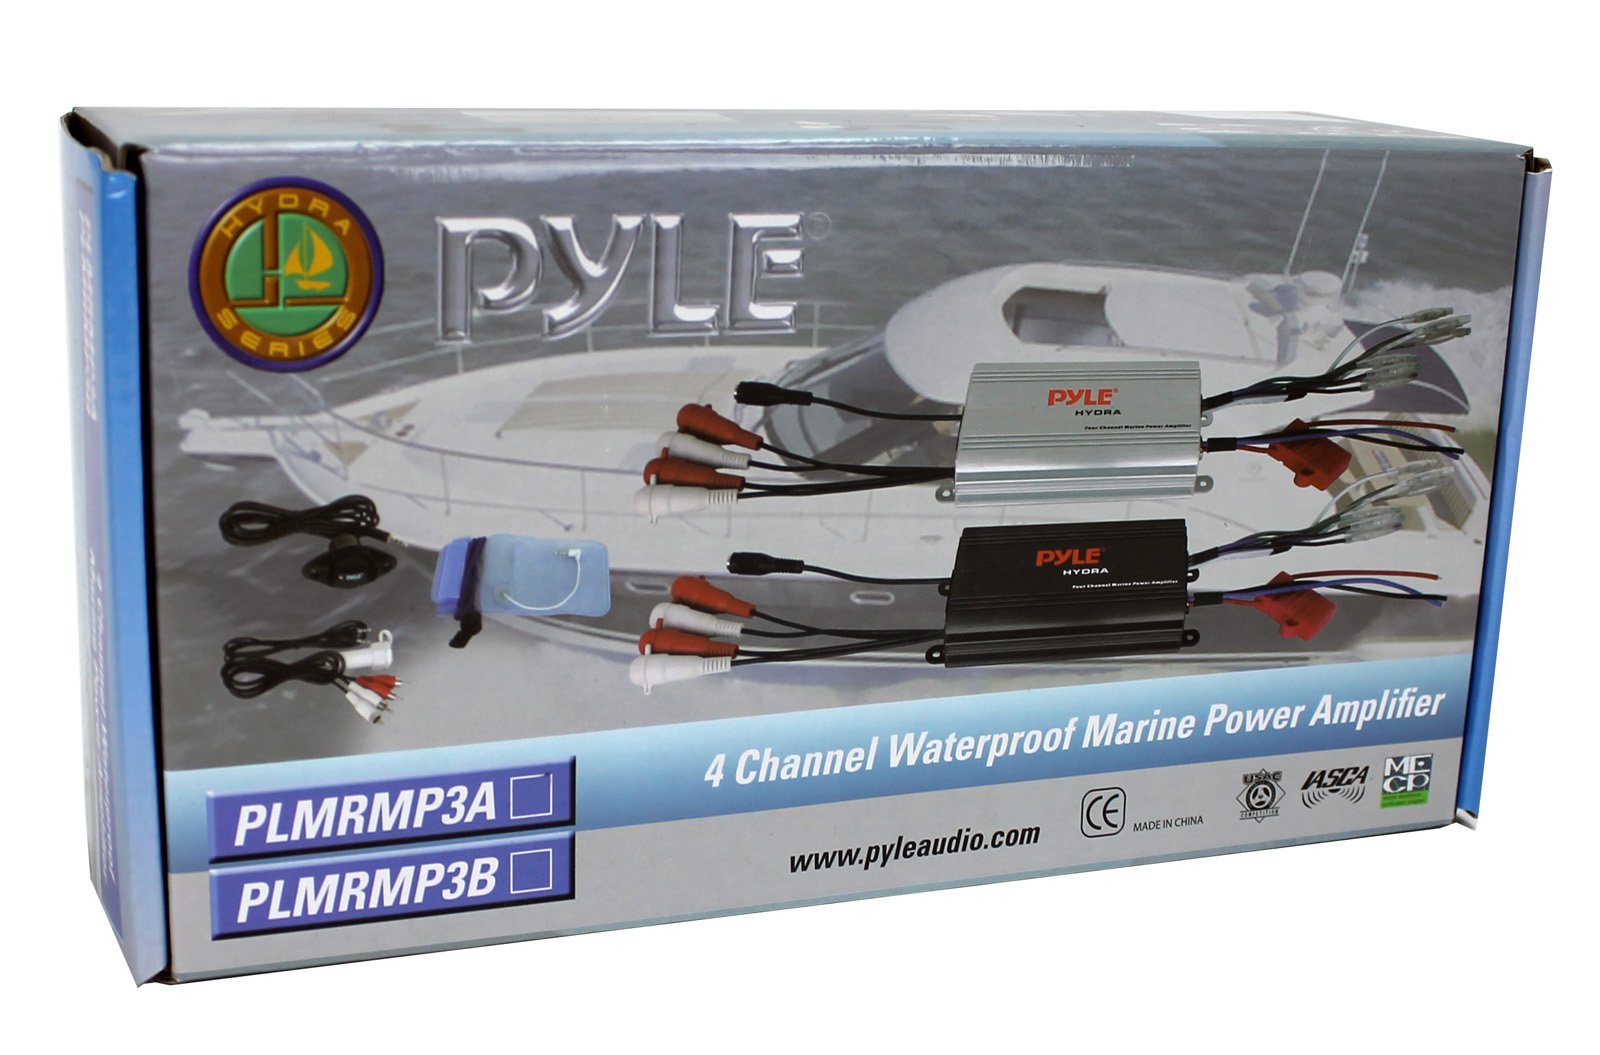 Pyle PLMRMP3A 4 Channel Marine Waterproof MP3/iPod Amplifier + Bluetooth  Dongle - Walmart.com